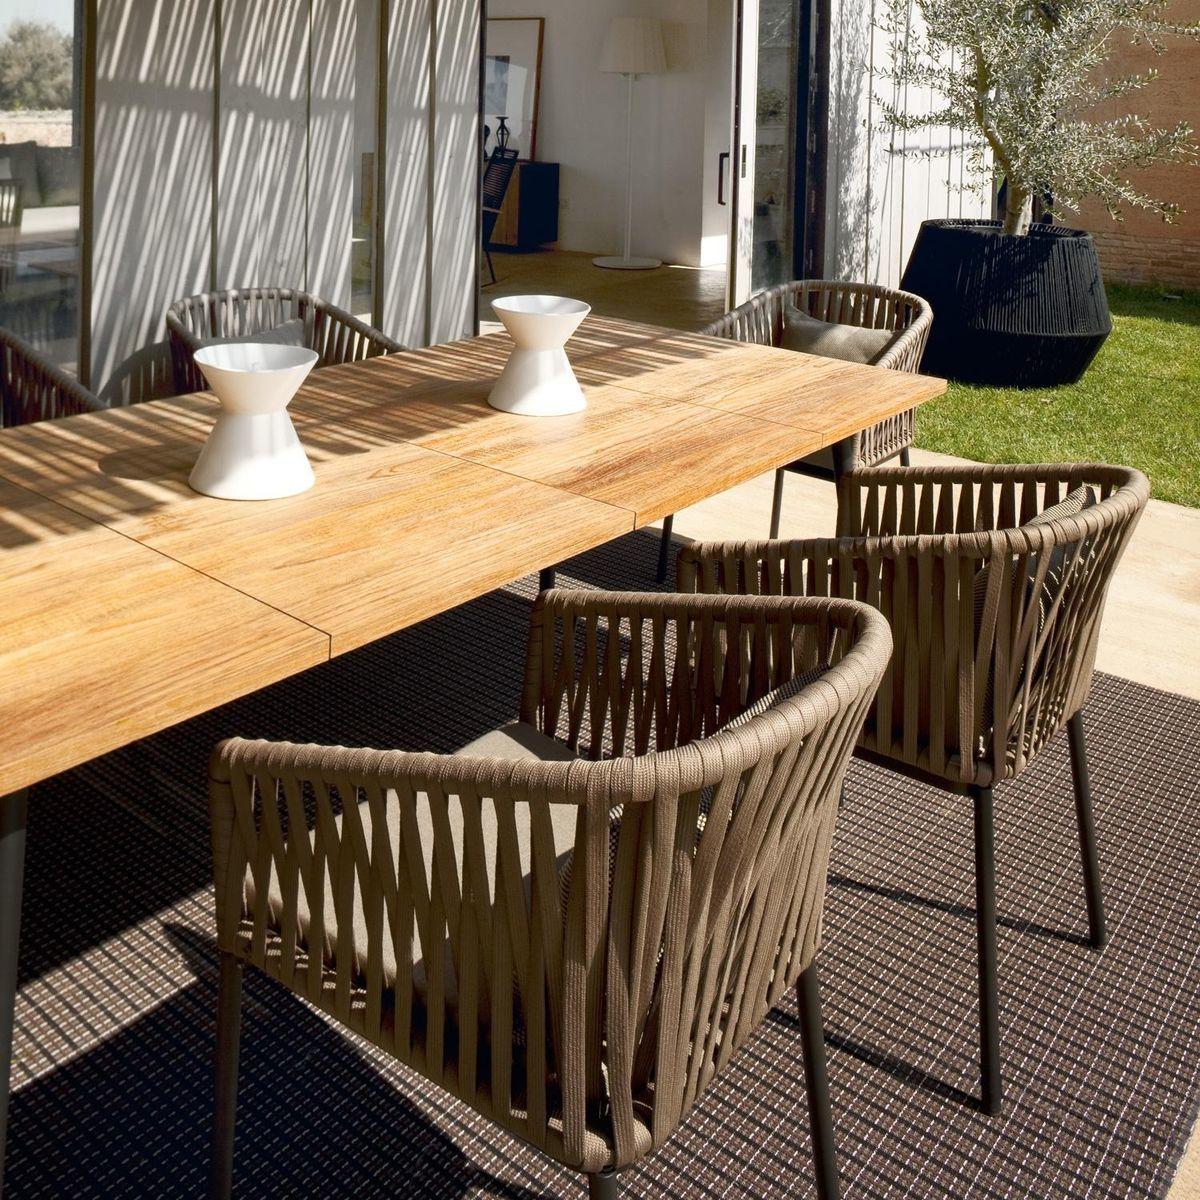 Bitta modern patio furniture by rodolfo dordoni - Kettal Bitta Garden Chair Armchair Bitta Garden Chair Armchair Kettal Ambientedirect